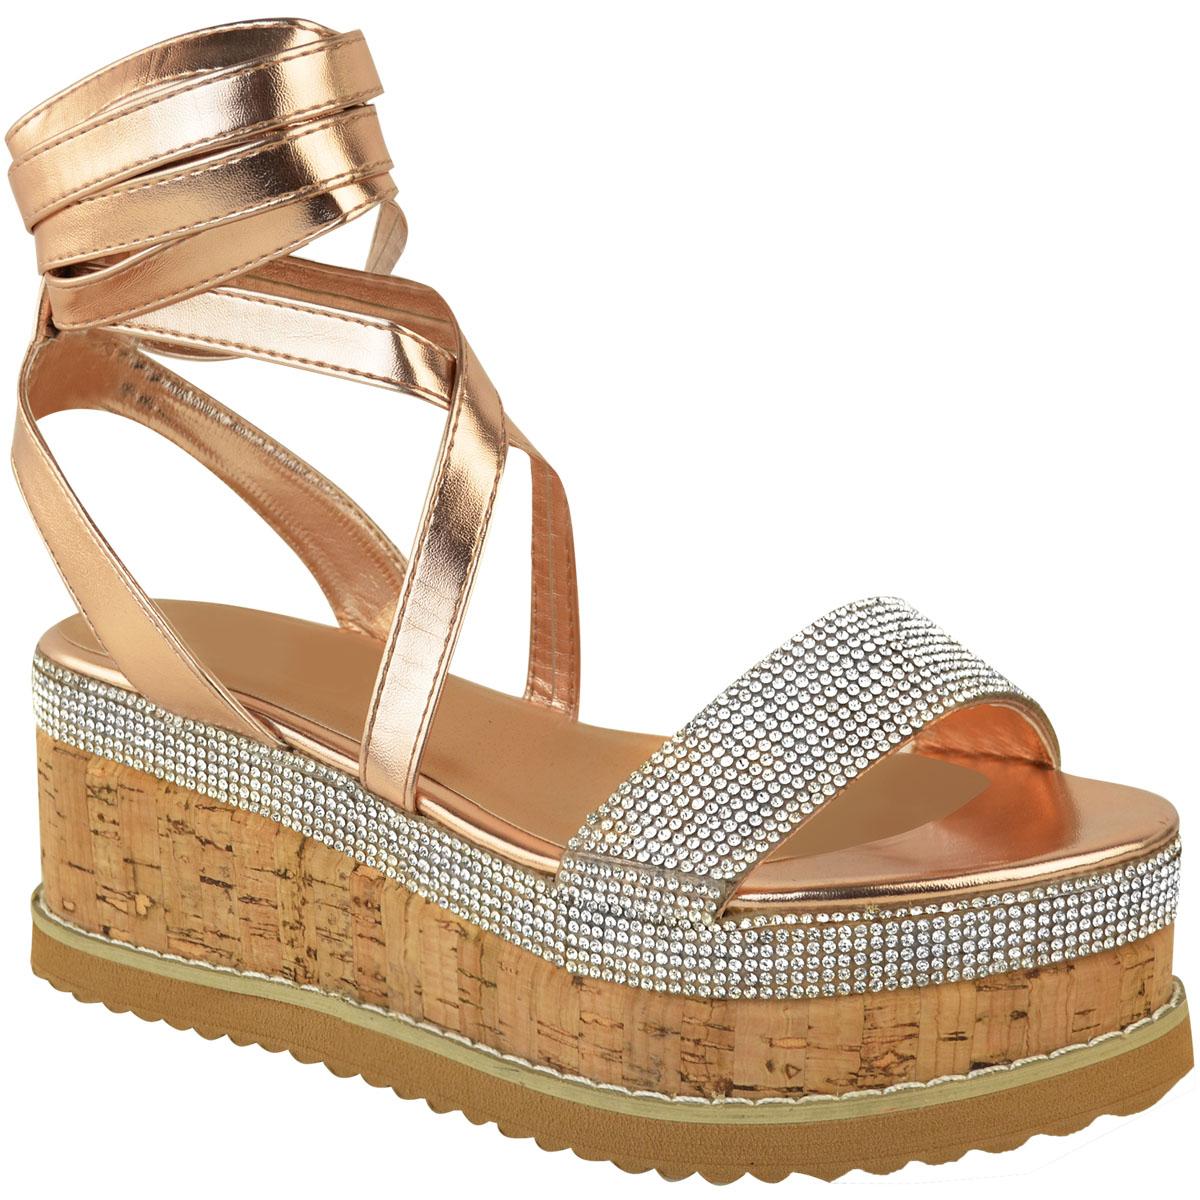 Womens-Ladies-Flatform-Diamante-Wedge-Sandals-Platform-Ankle-Lace-Up-Summer-Size thumbnail 8